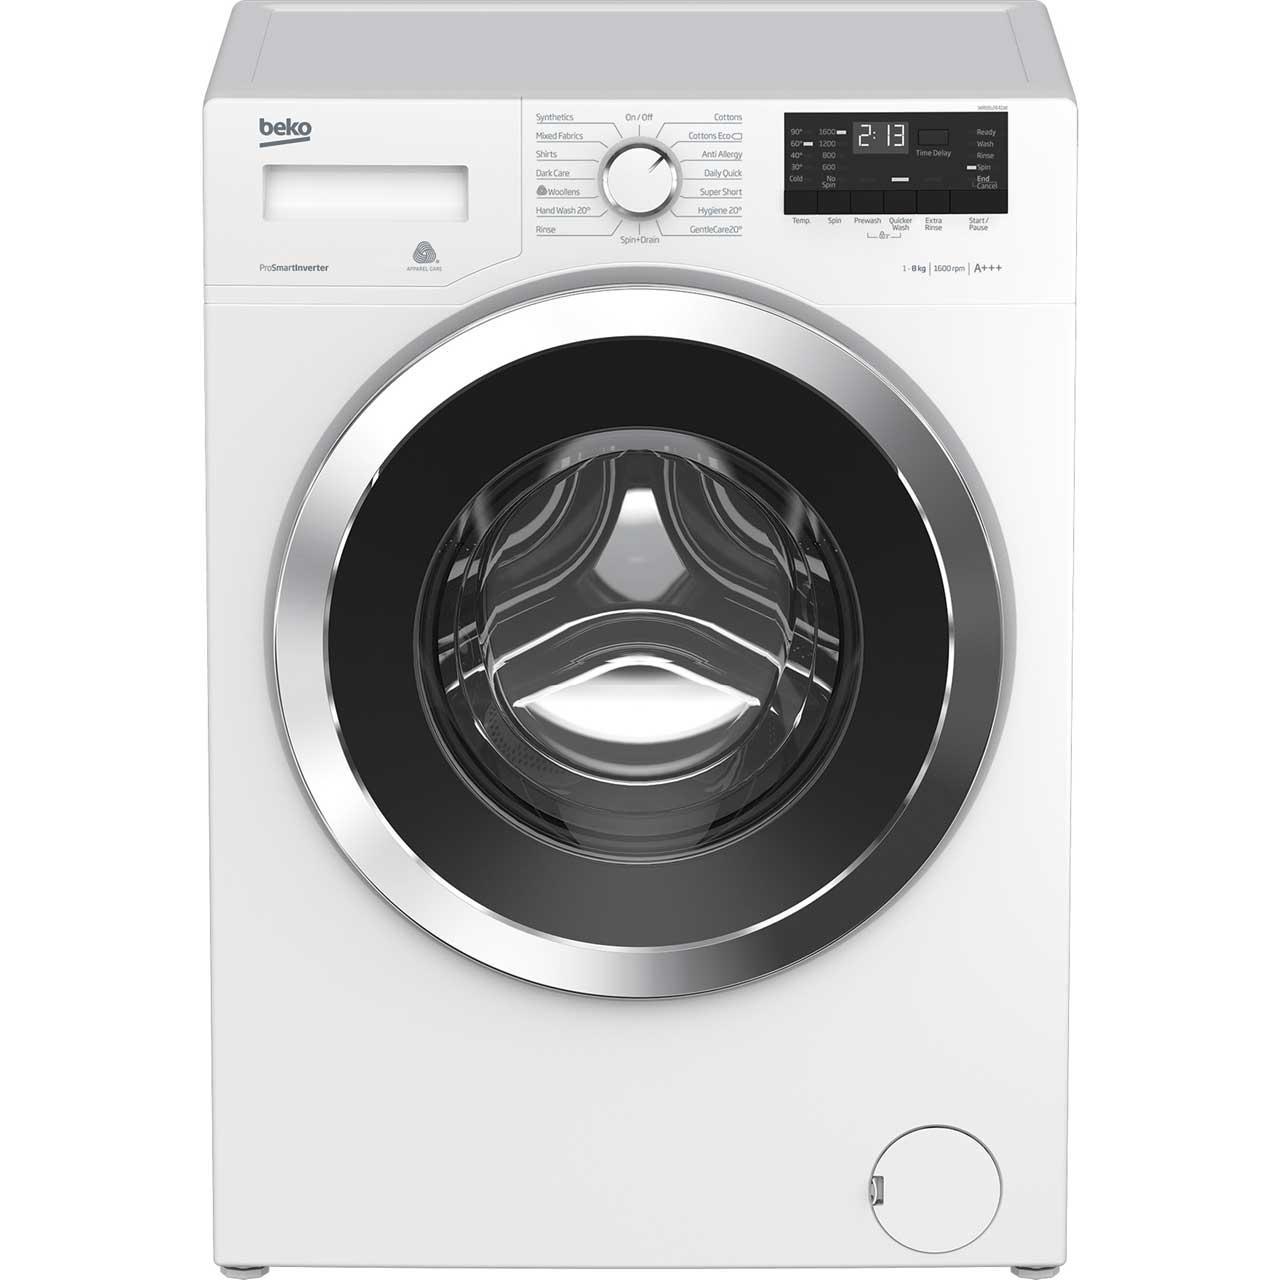 Beko WR862441W Free Standing Washing Machine in White